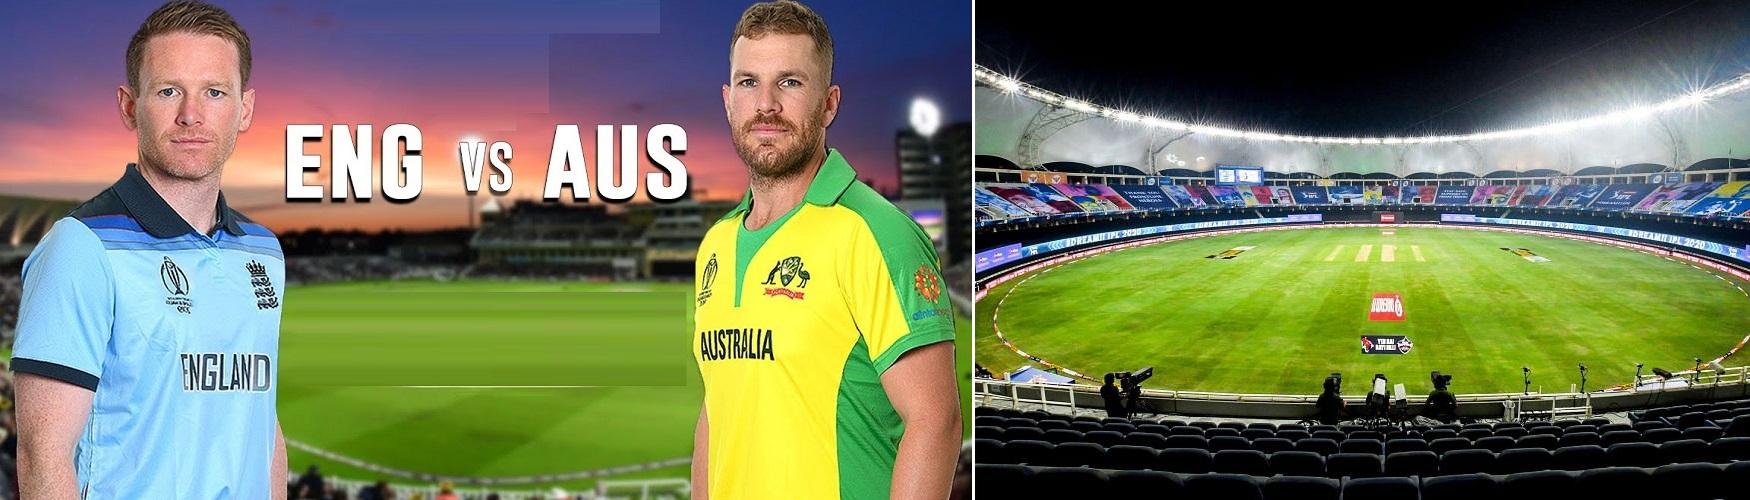 England vs Australia Tickets